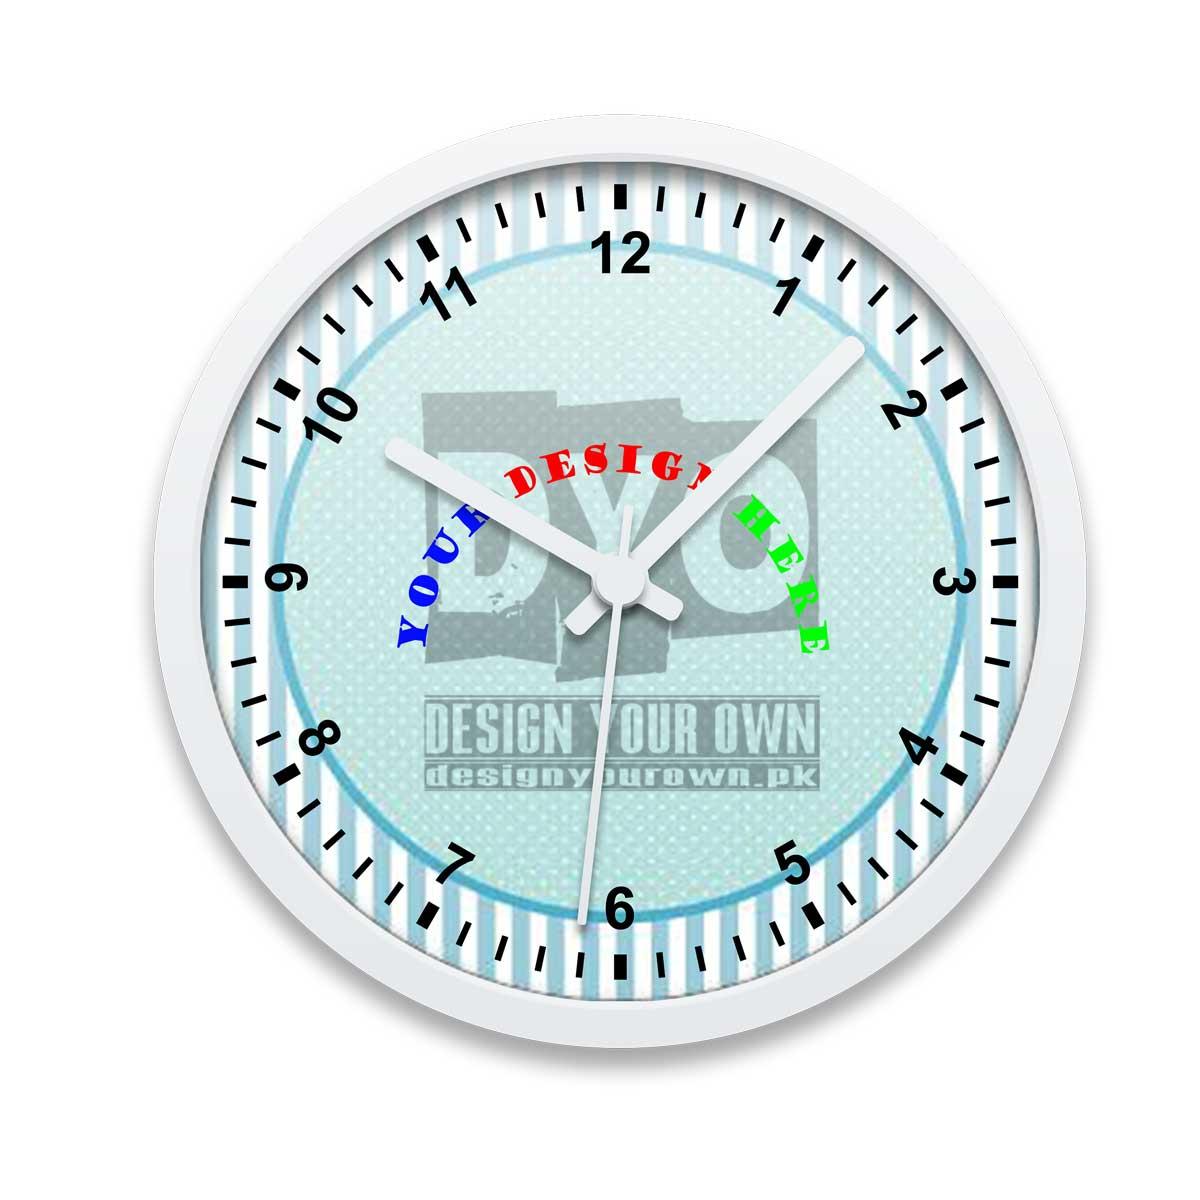 Customizable Gift Wall Clock Design Your Own Pakistan